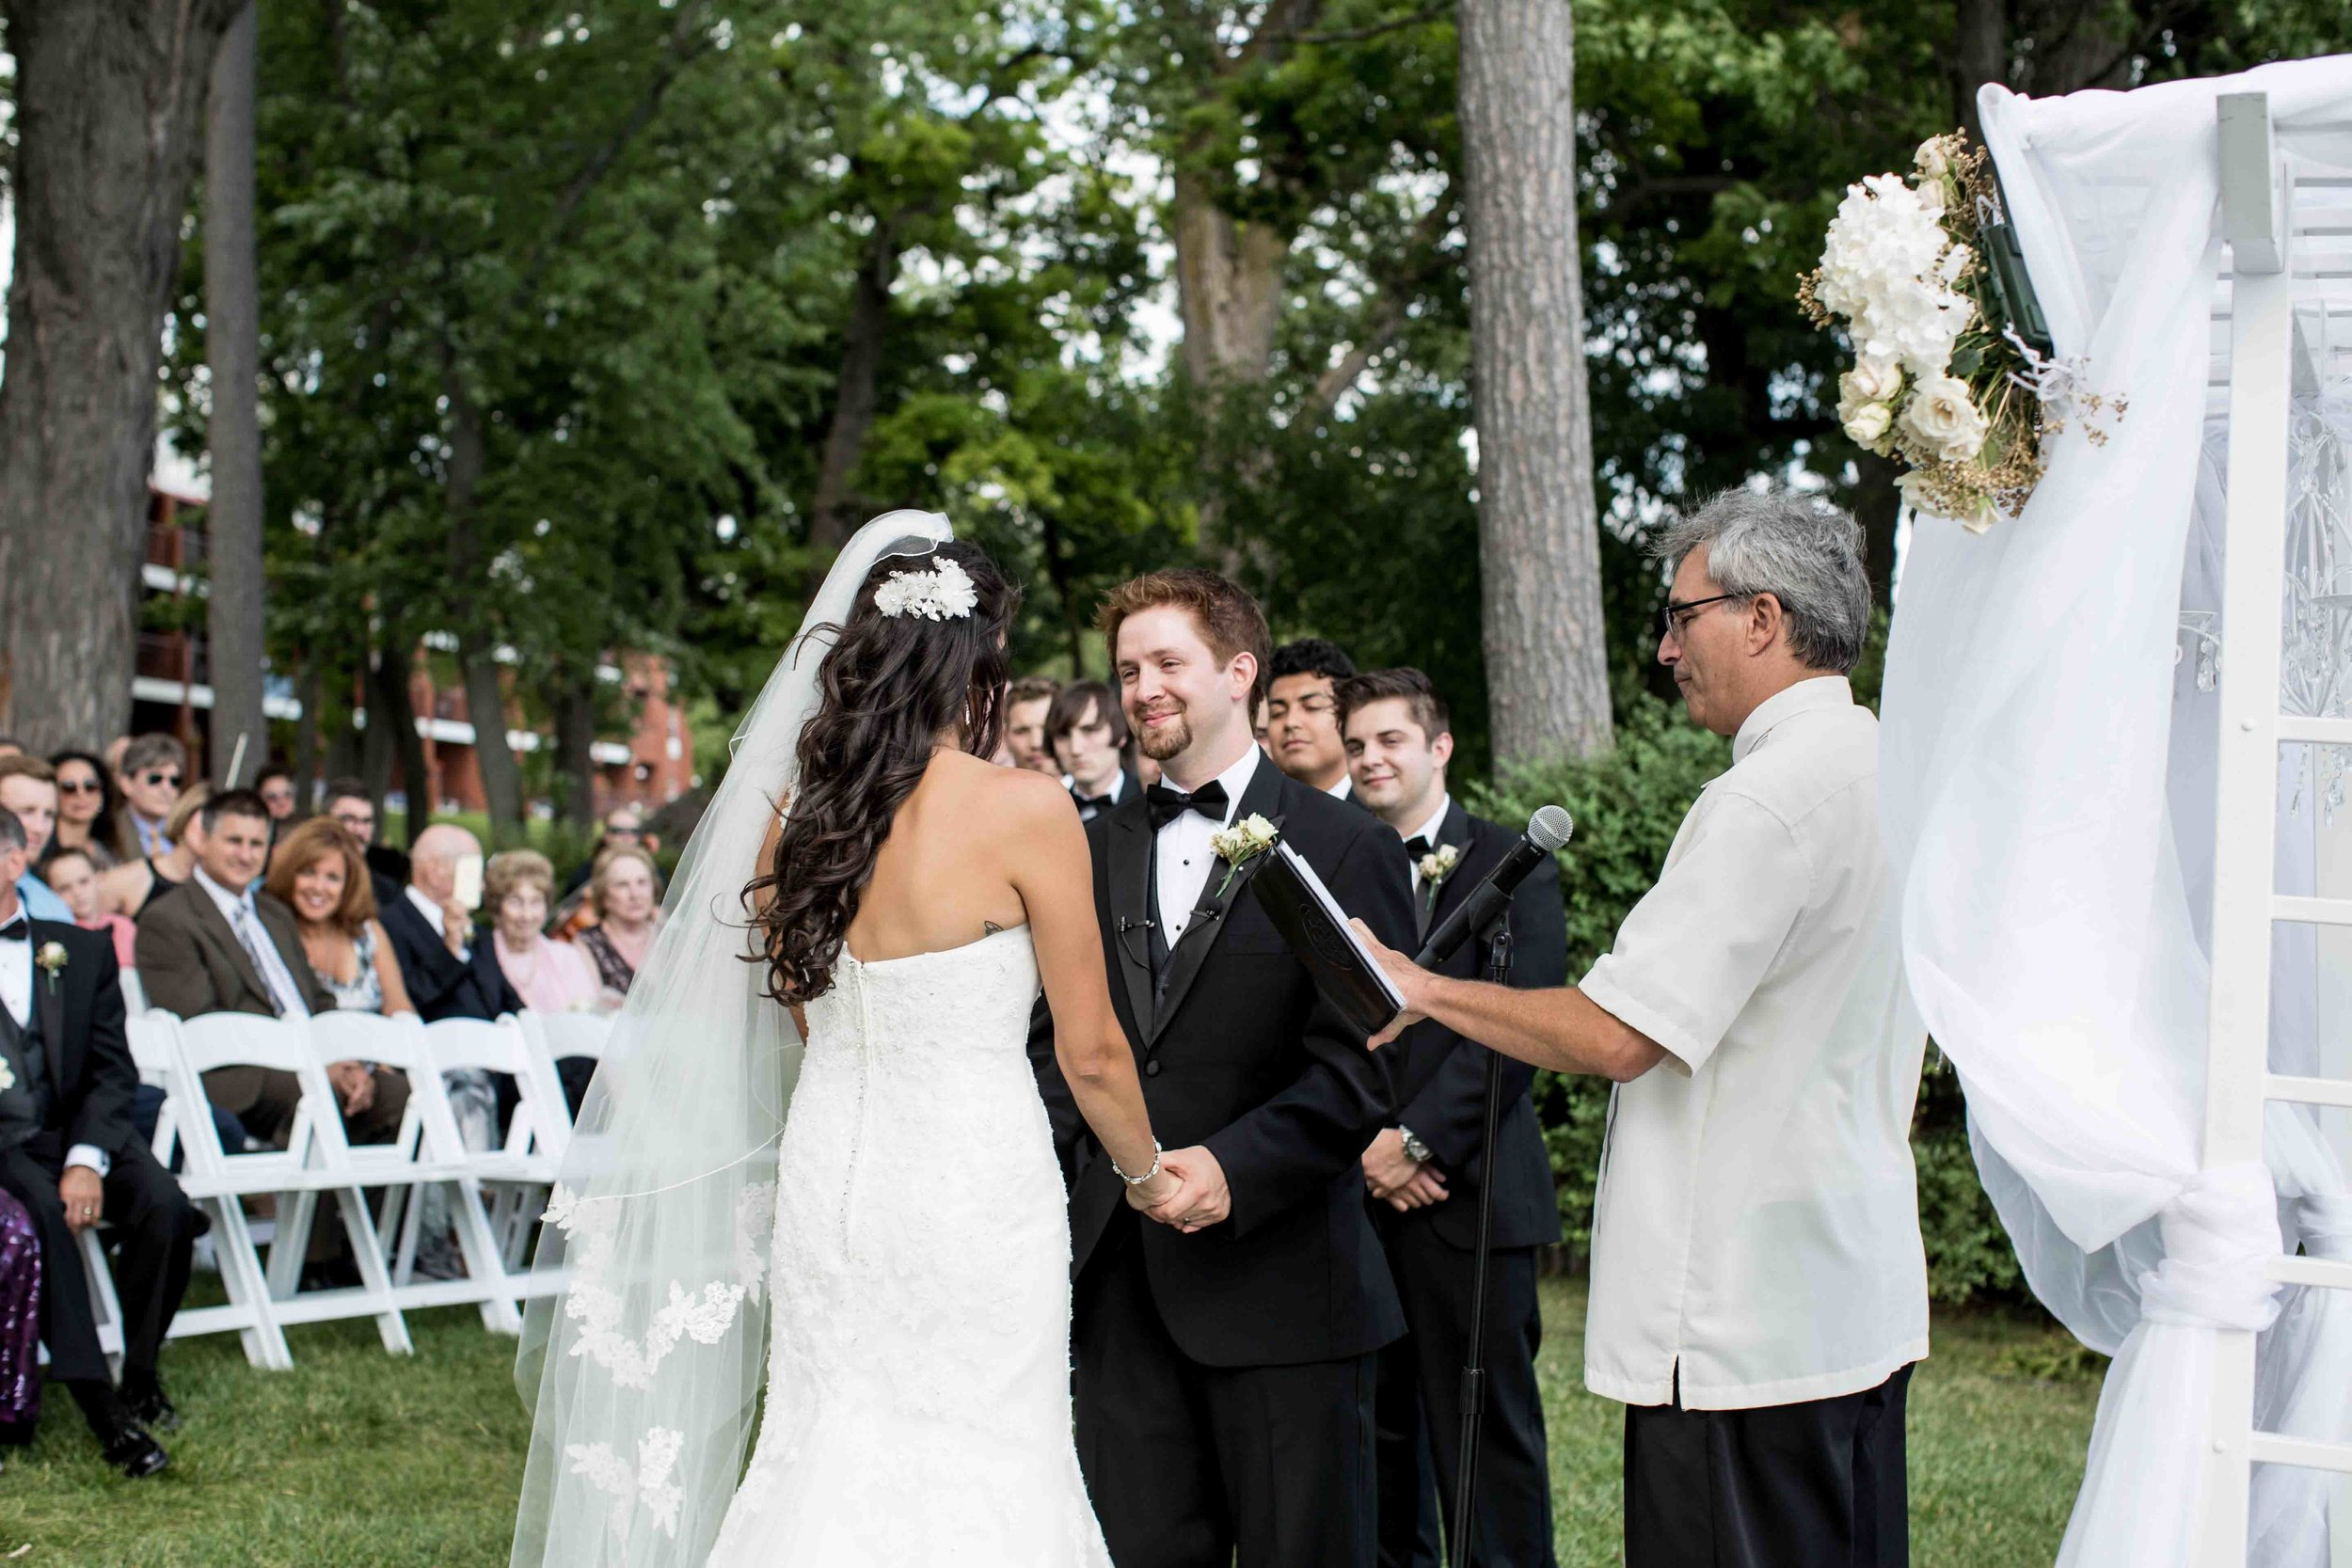 Destination Photographer wedding photos Best Wedding Photography Rose Photo -14.jpg